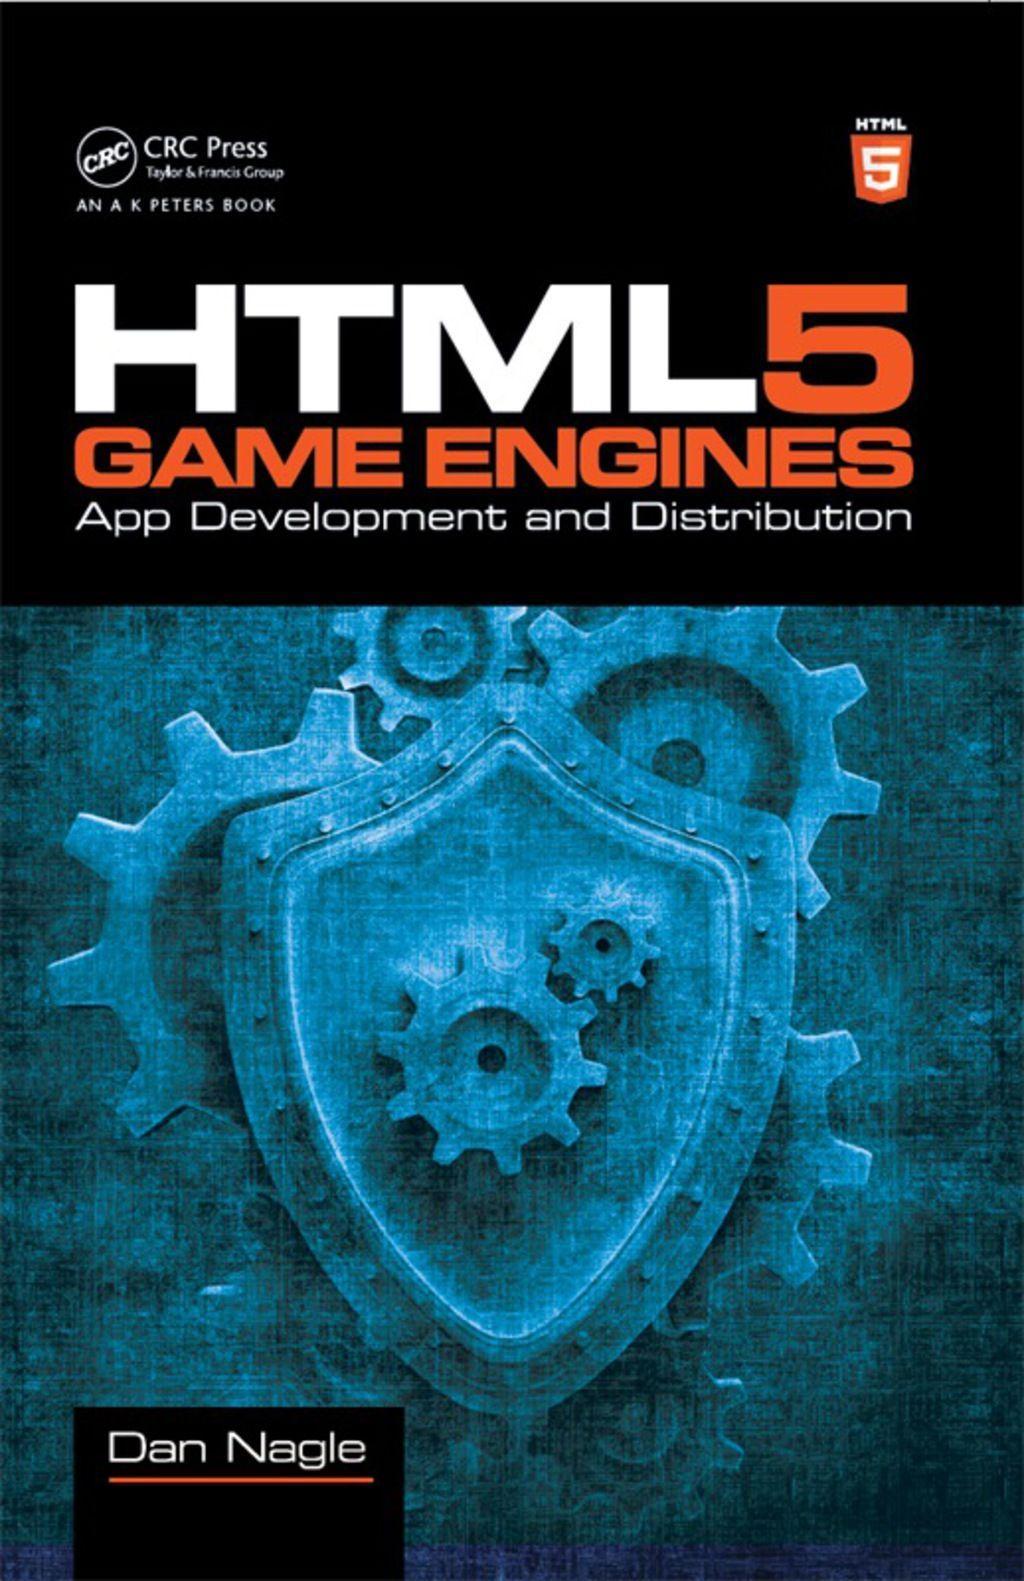 HTML5 Game Engines (eBook Rental) in 2020 Game engine